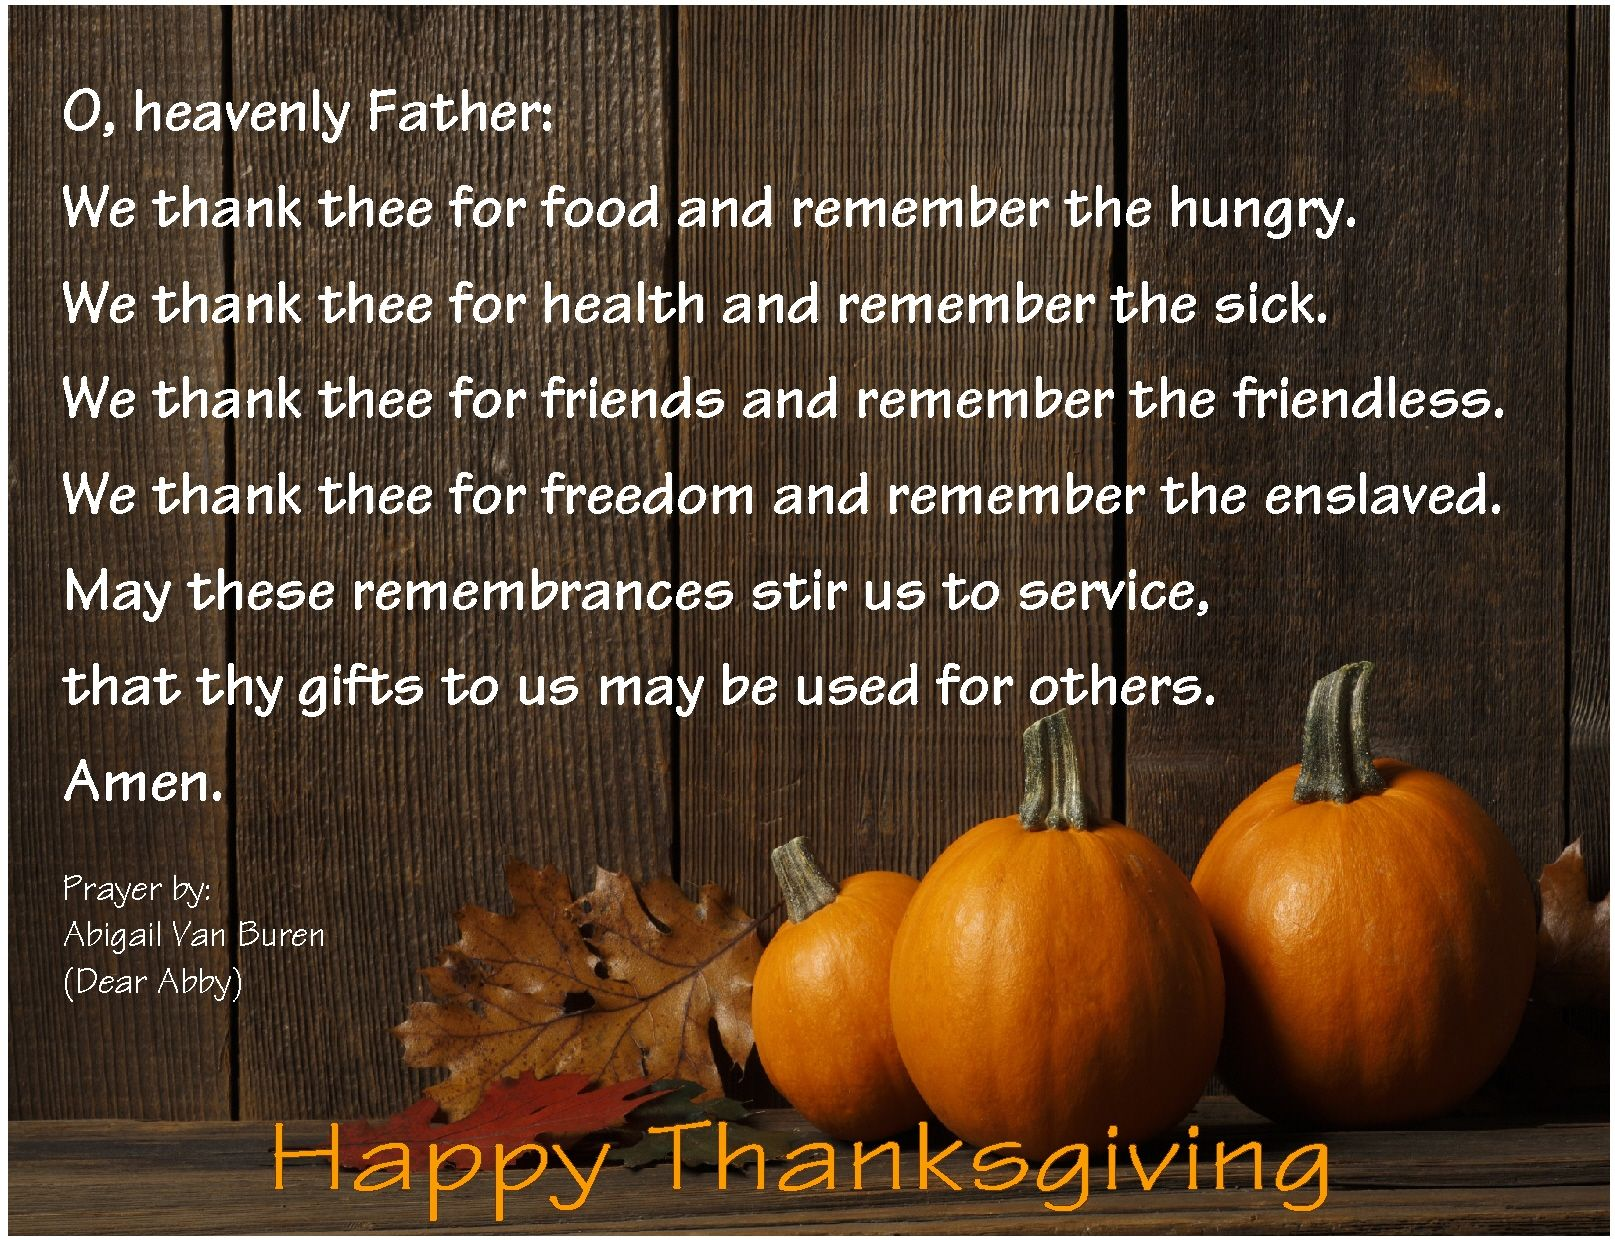 Thanksgiving prayer.jpg